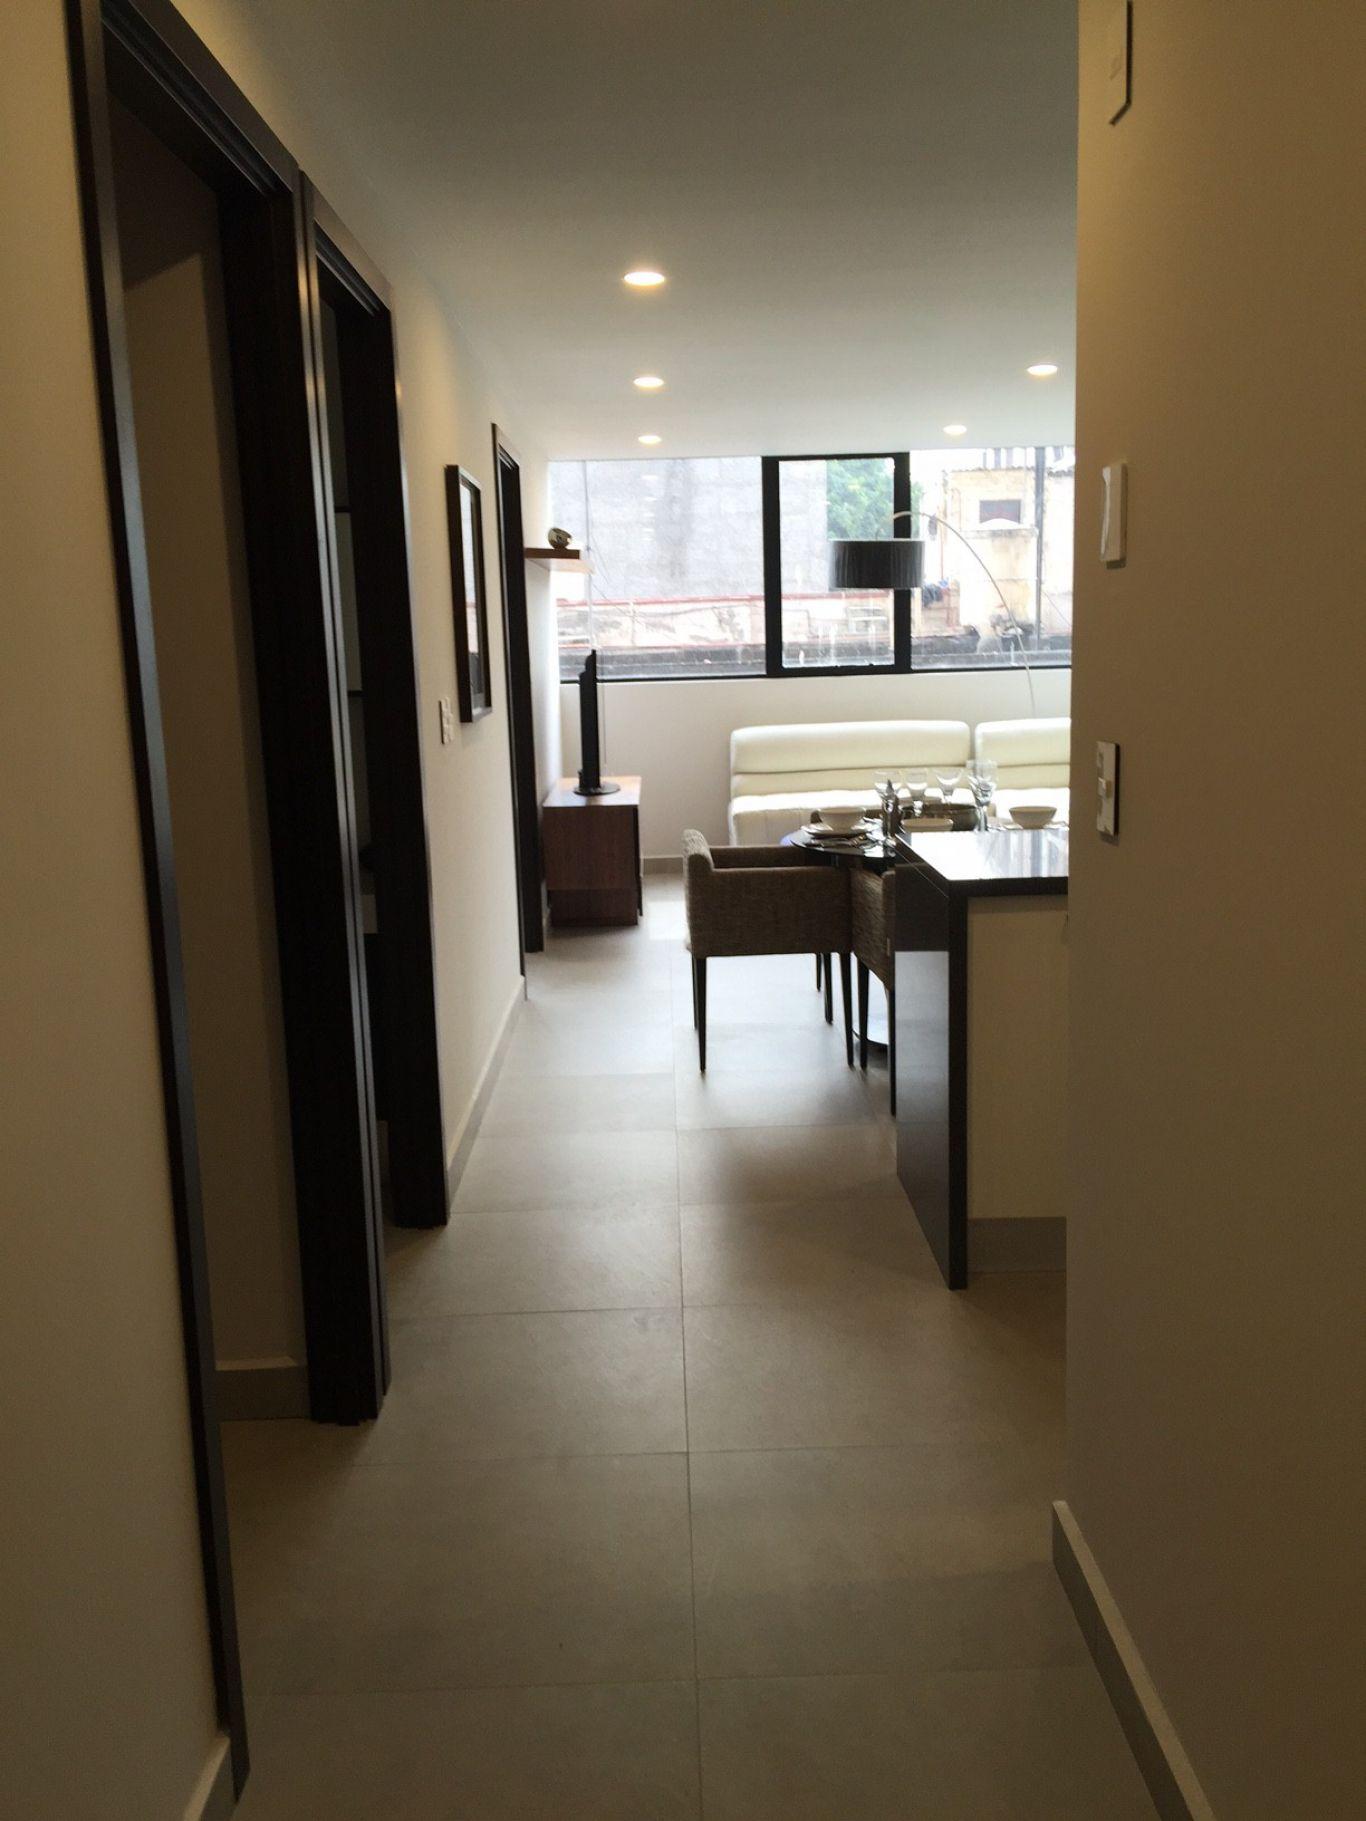 Id 1659155, capitolio residencial nuevo coyoacan, no 1,